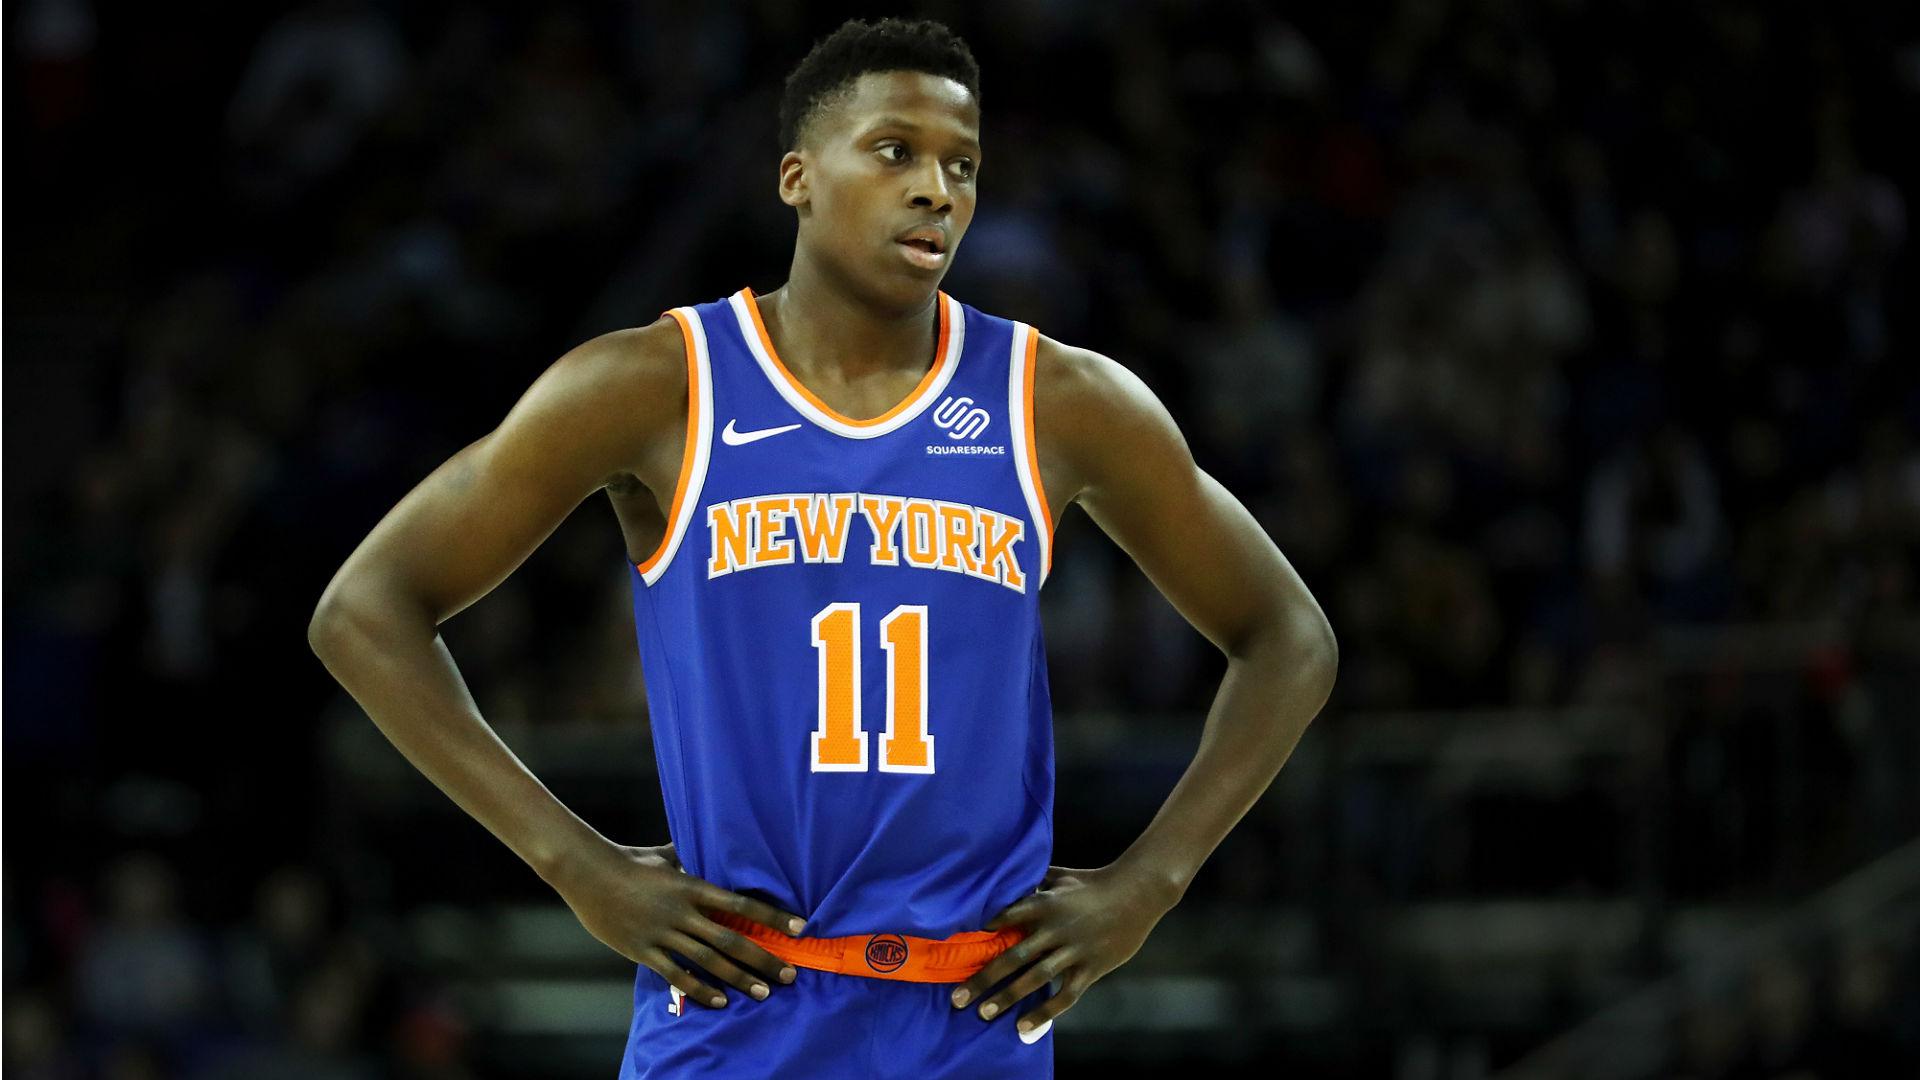 NBA trade rumors: Knicks looking to deal Frank Ntilikina for draft pick